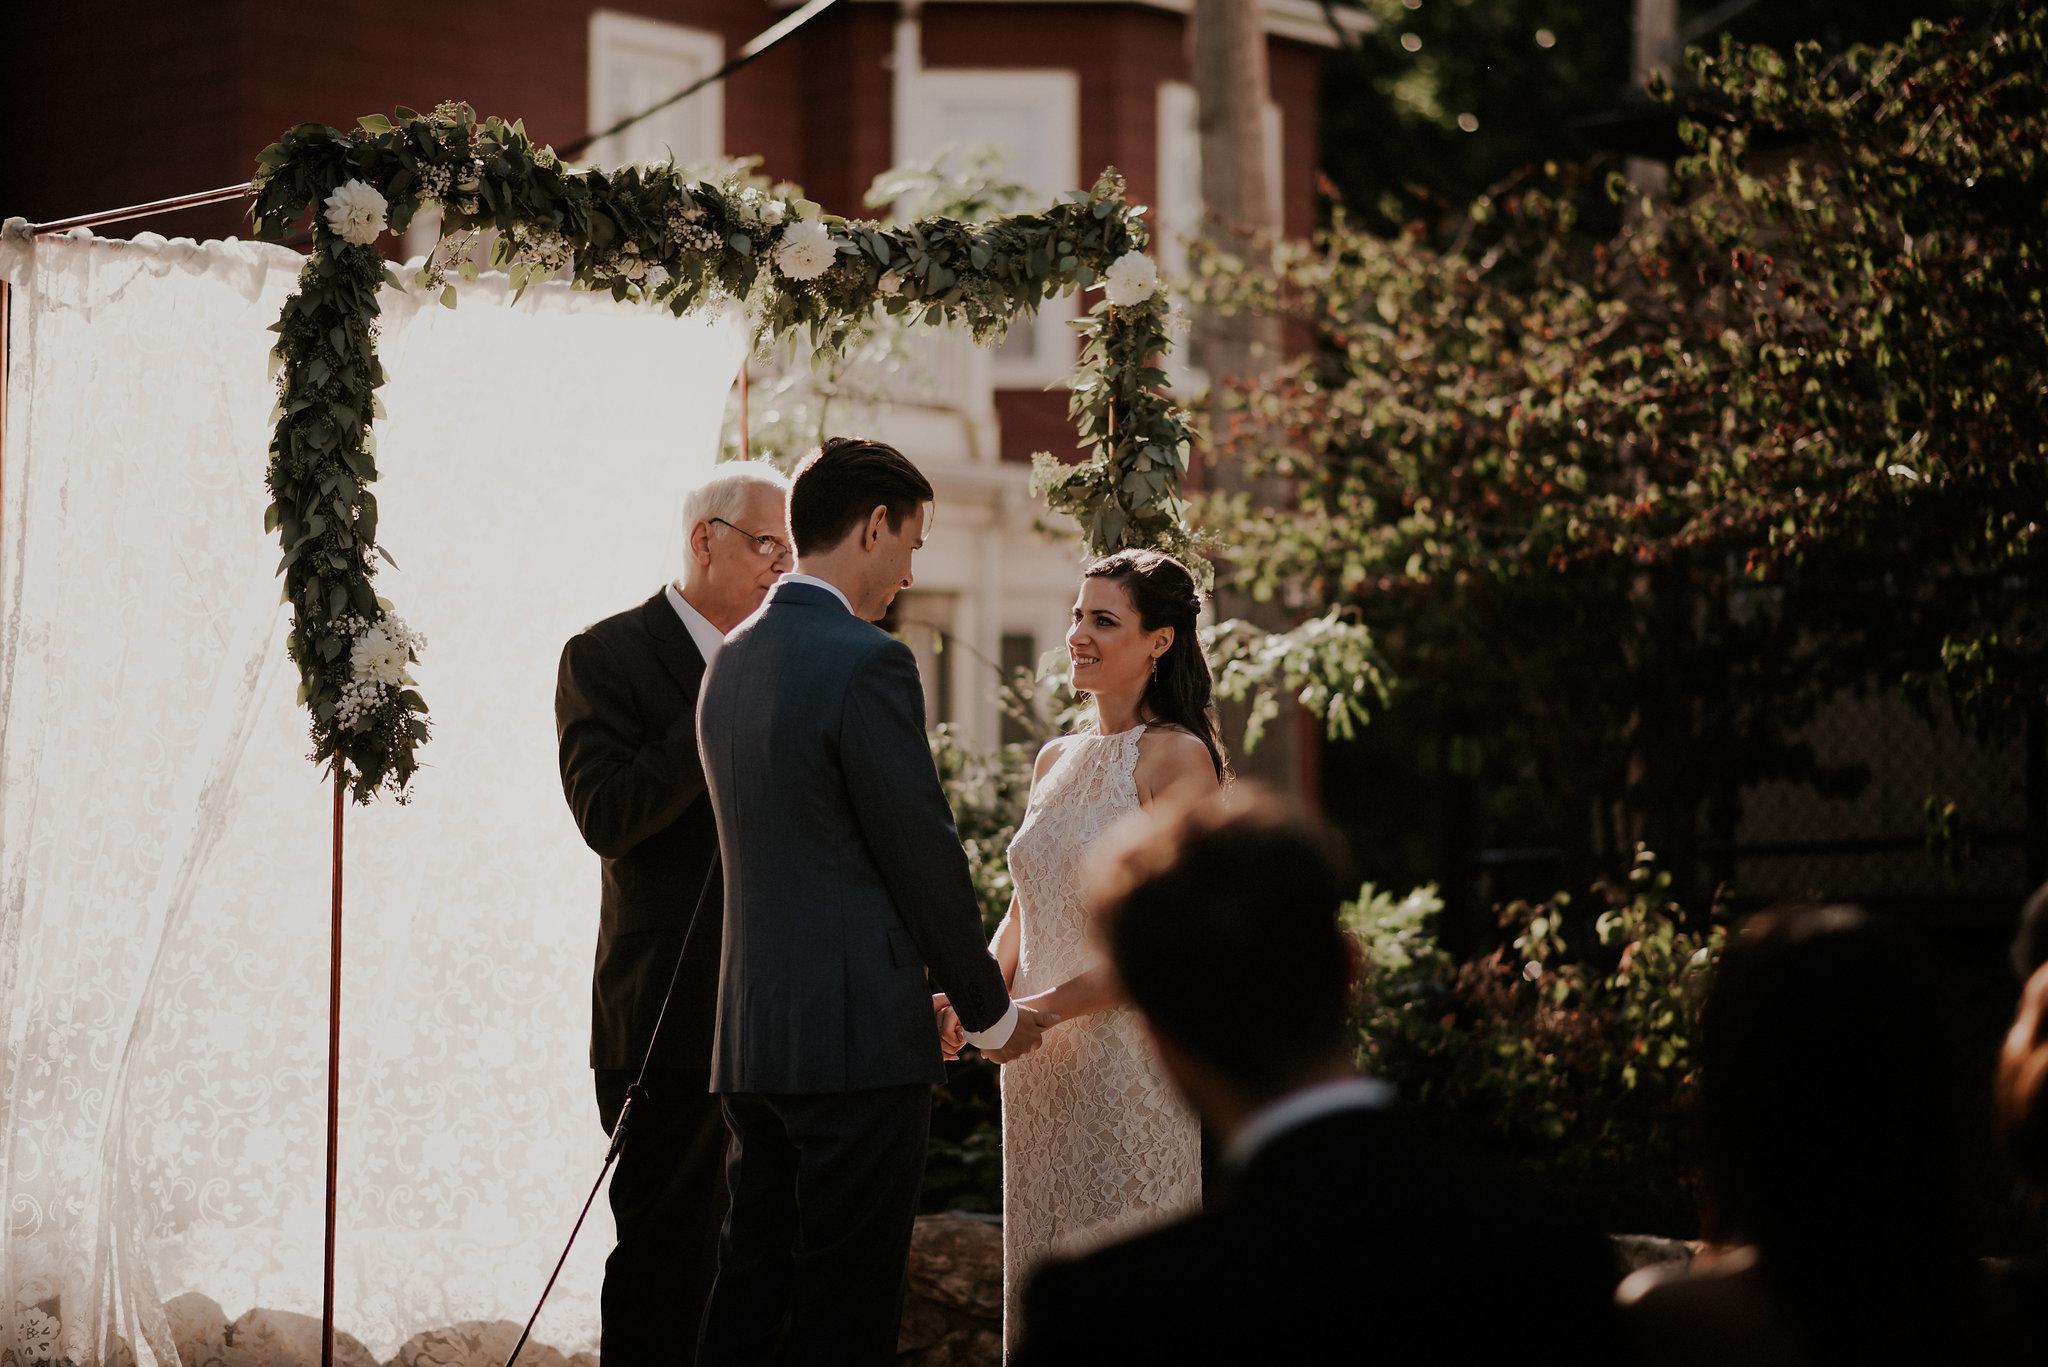 wildsoulsstudio - modern boston wedding-25.jpg